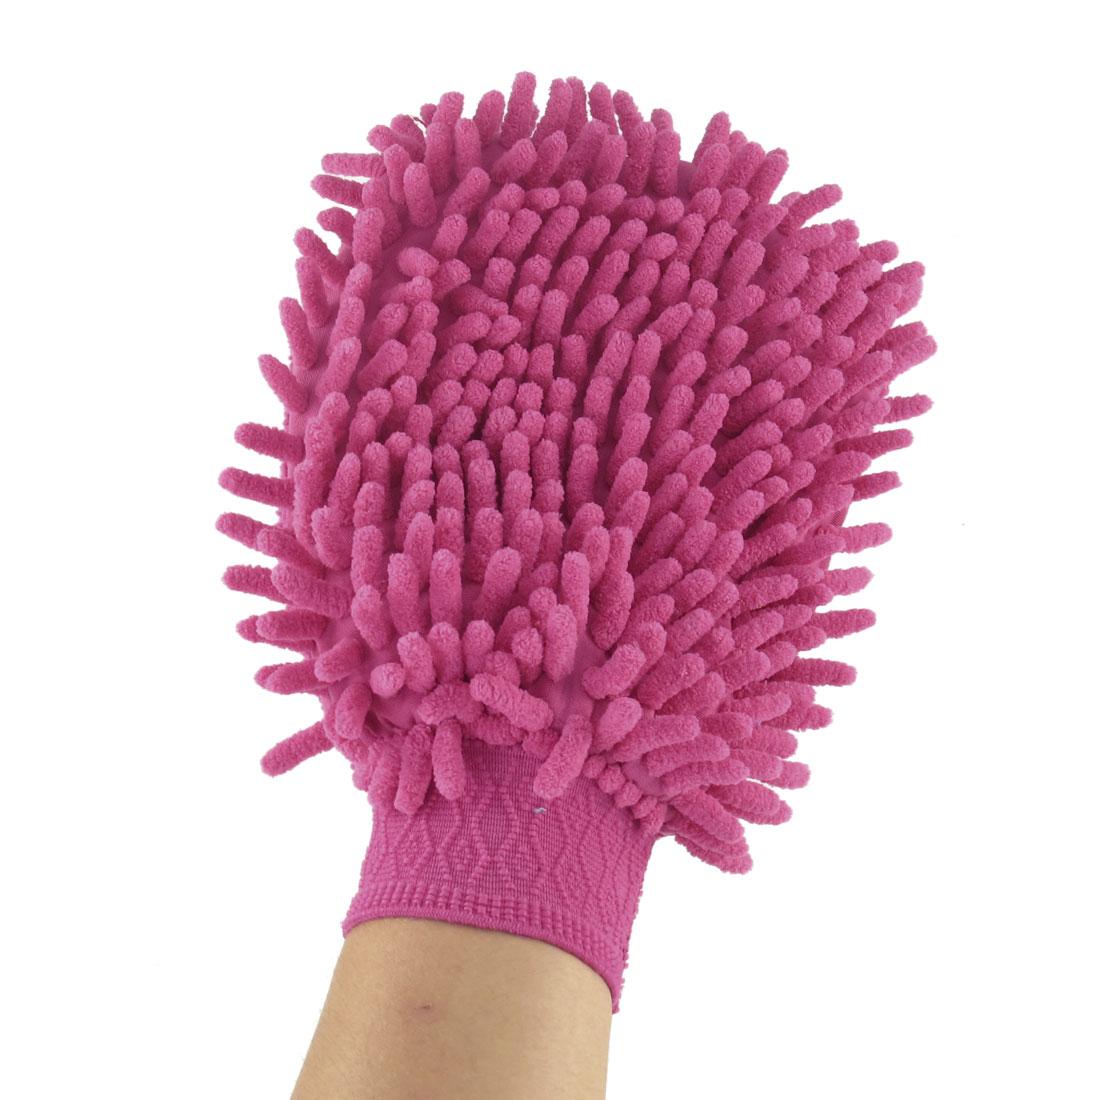 Fuchsia Elastic Cuff Microfiber Chenille Washing Cleaning Brush Glove for Car